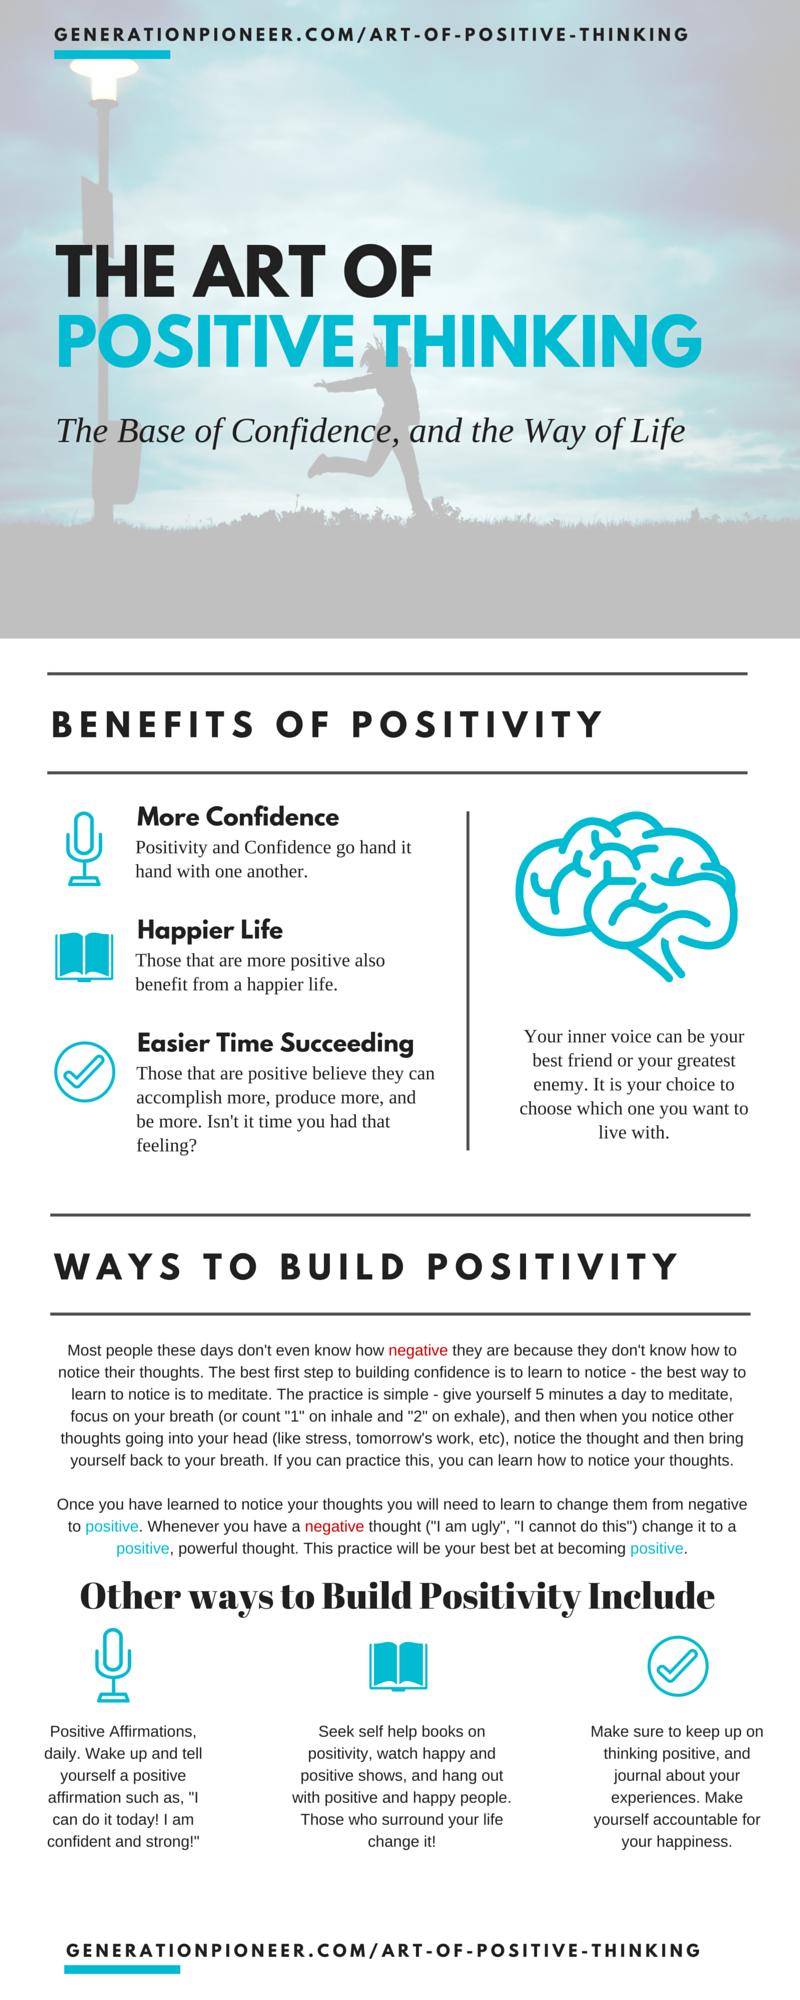 The Art of Positivity